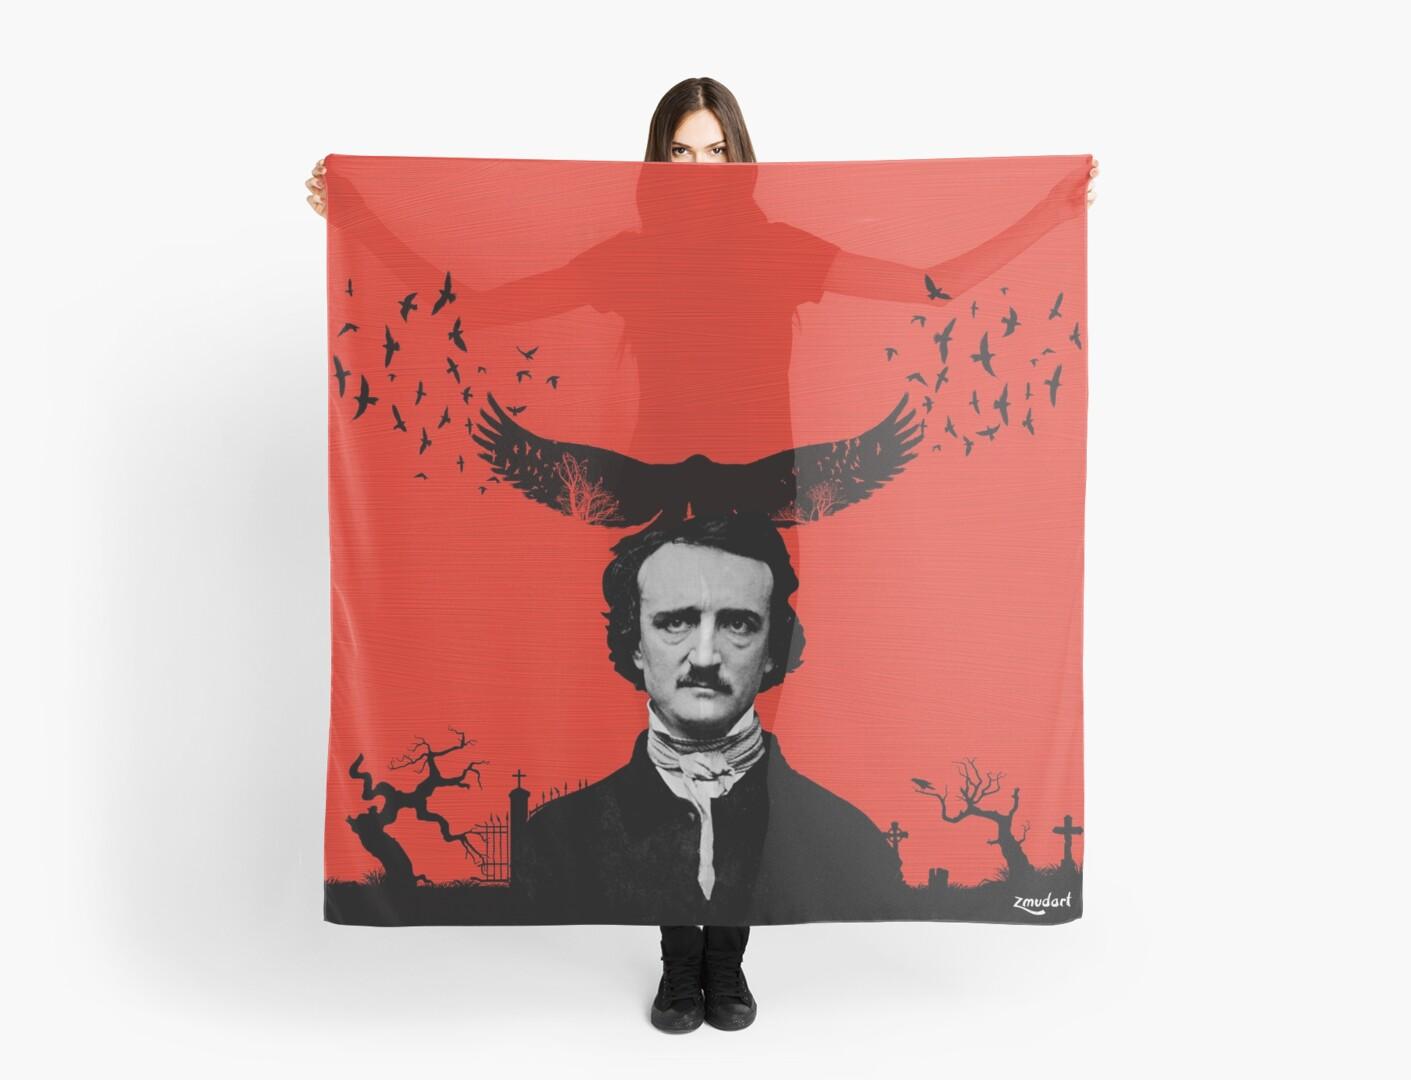 Edgar Allan Poe / Raven / Digital Painting by zmudart